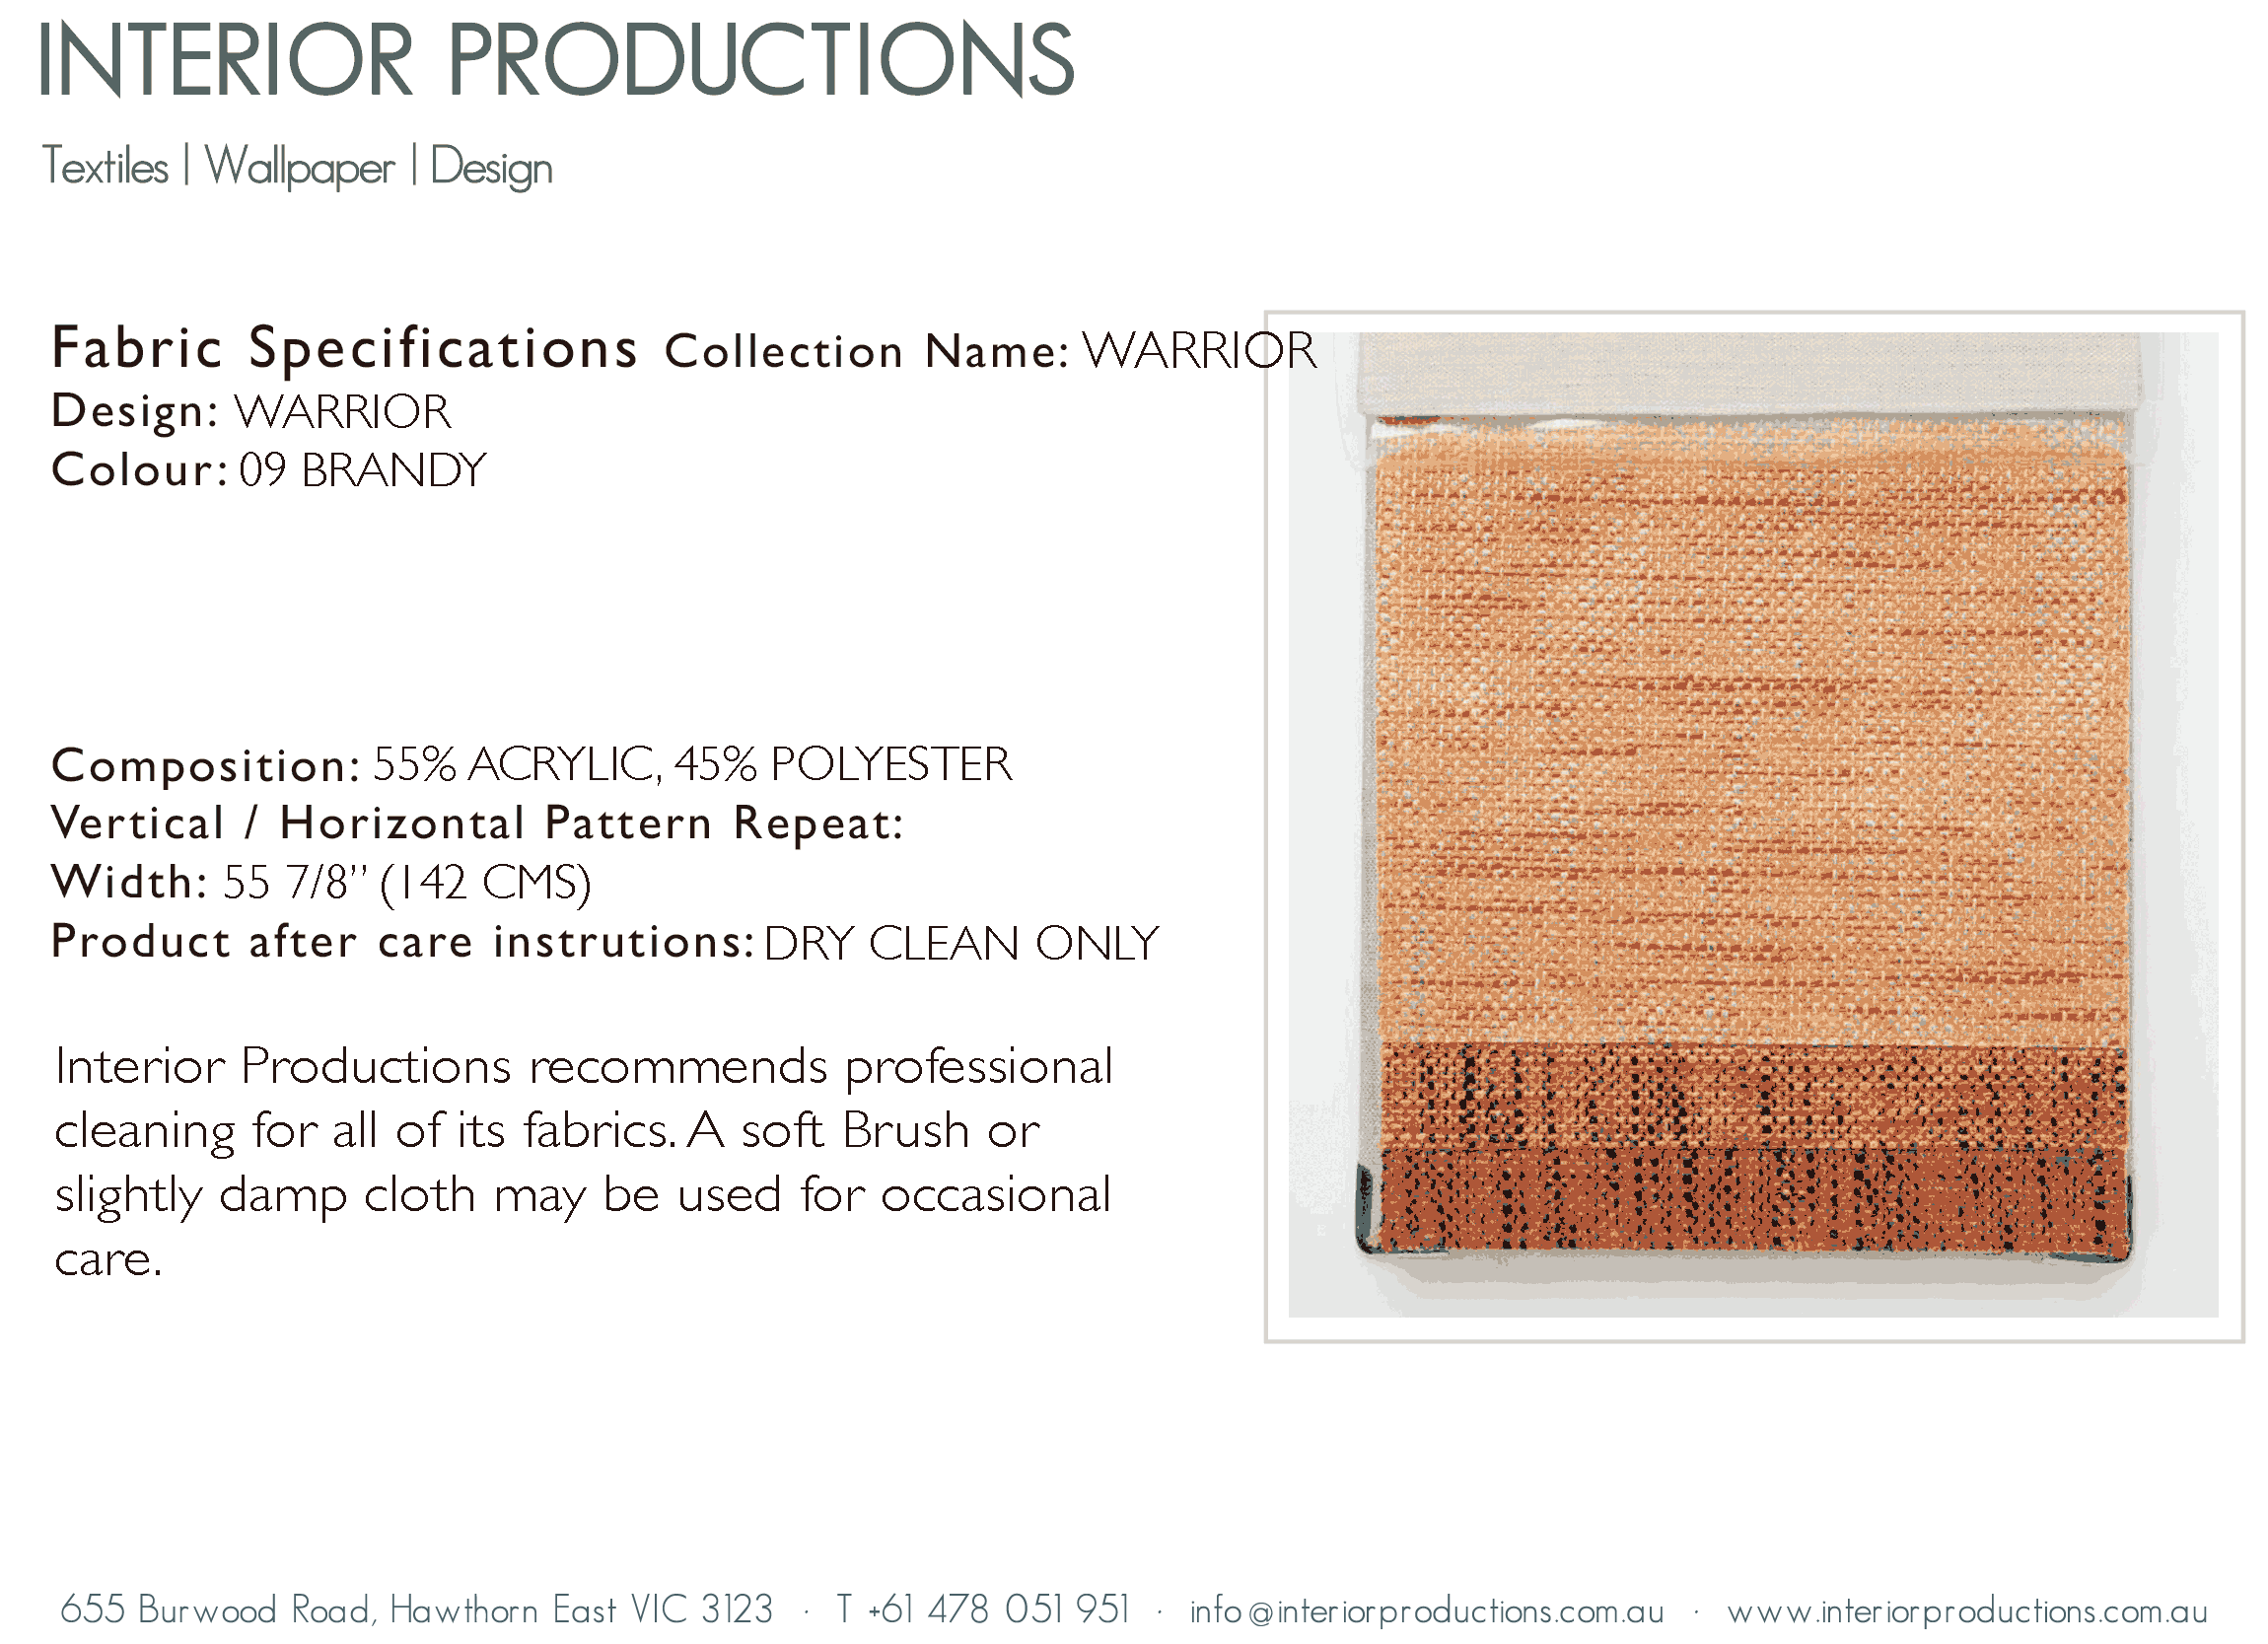 interior_productions_WARRIOR---09-BRANDY